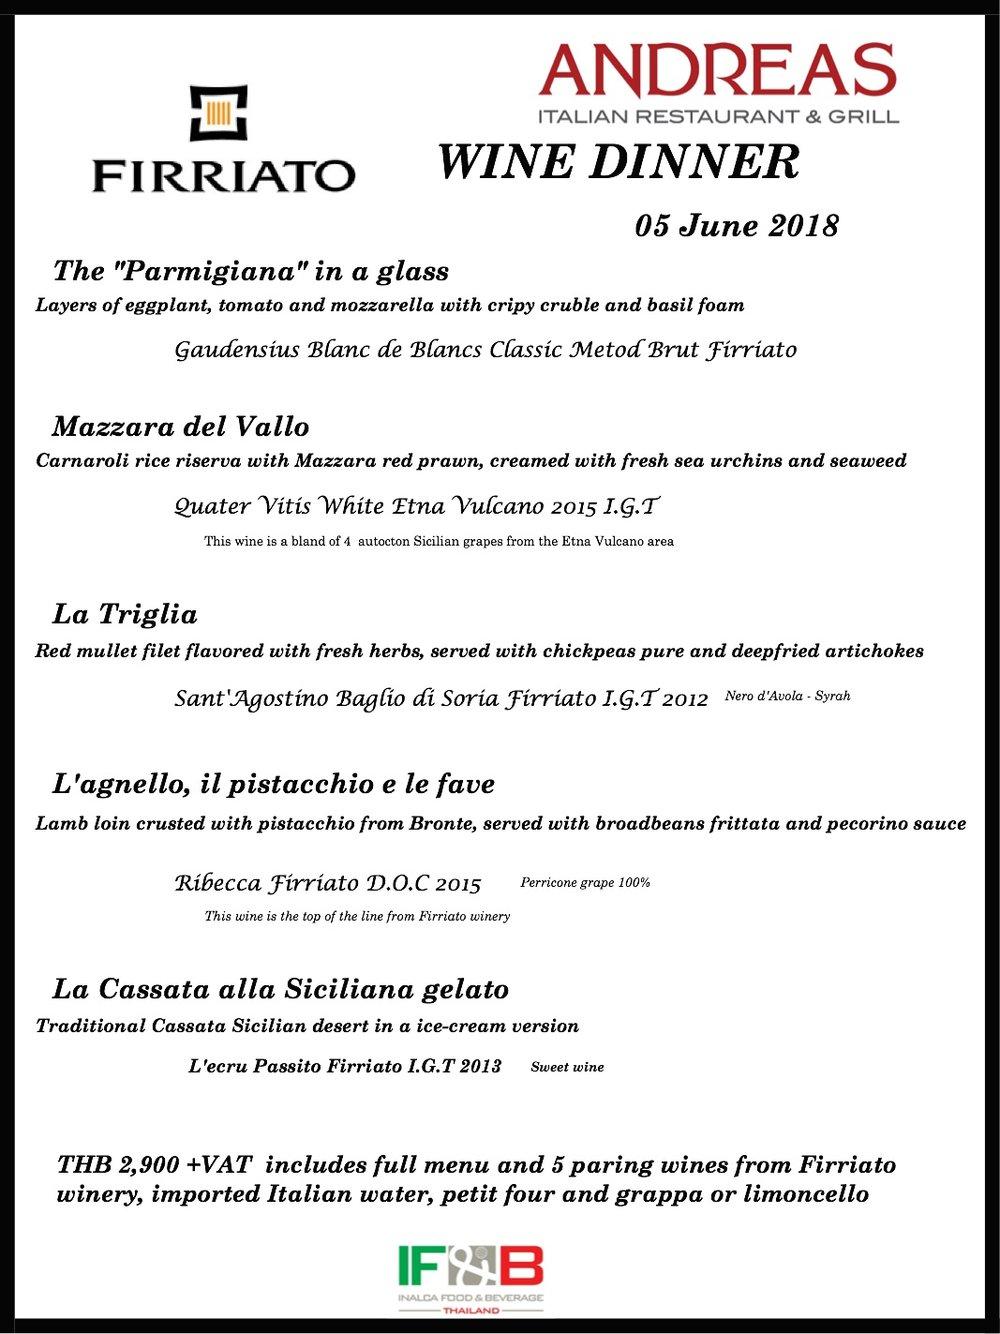 Firriato wine dinner 2018.jpg